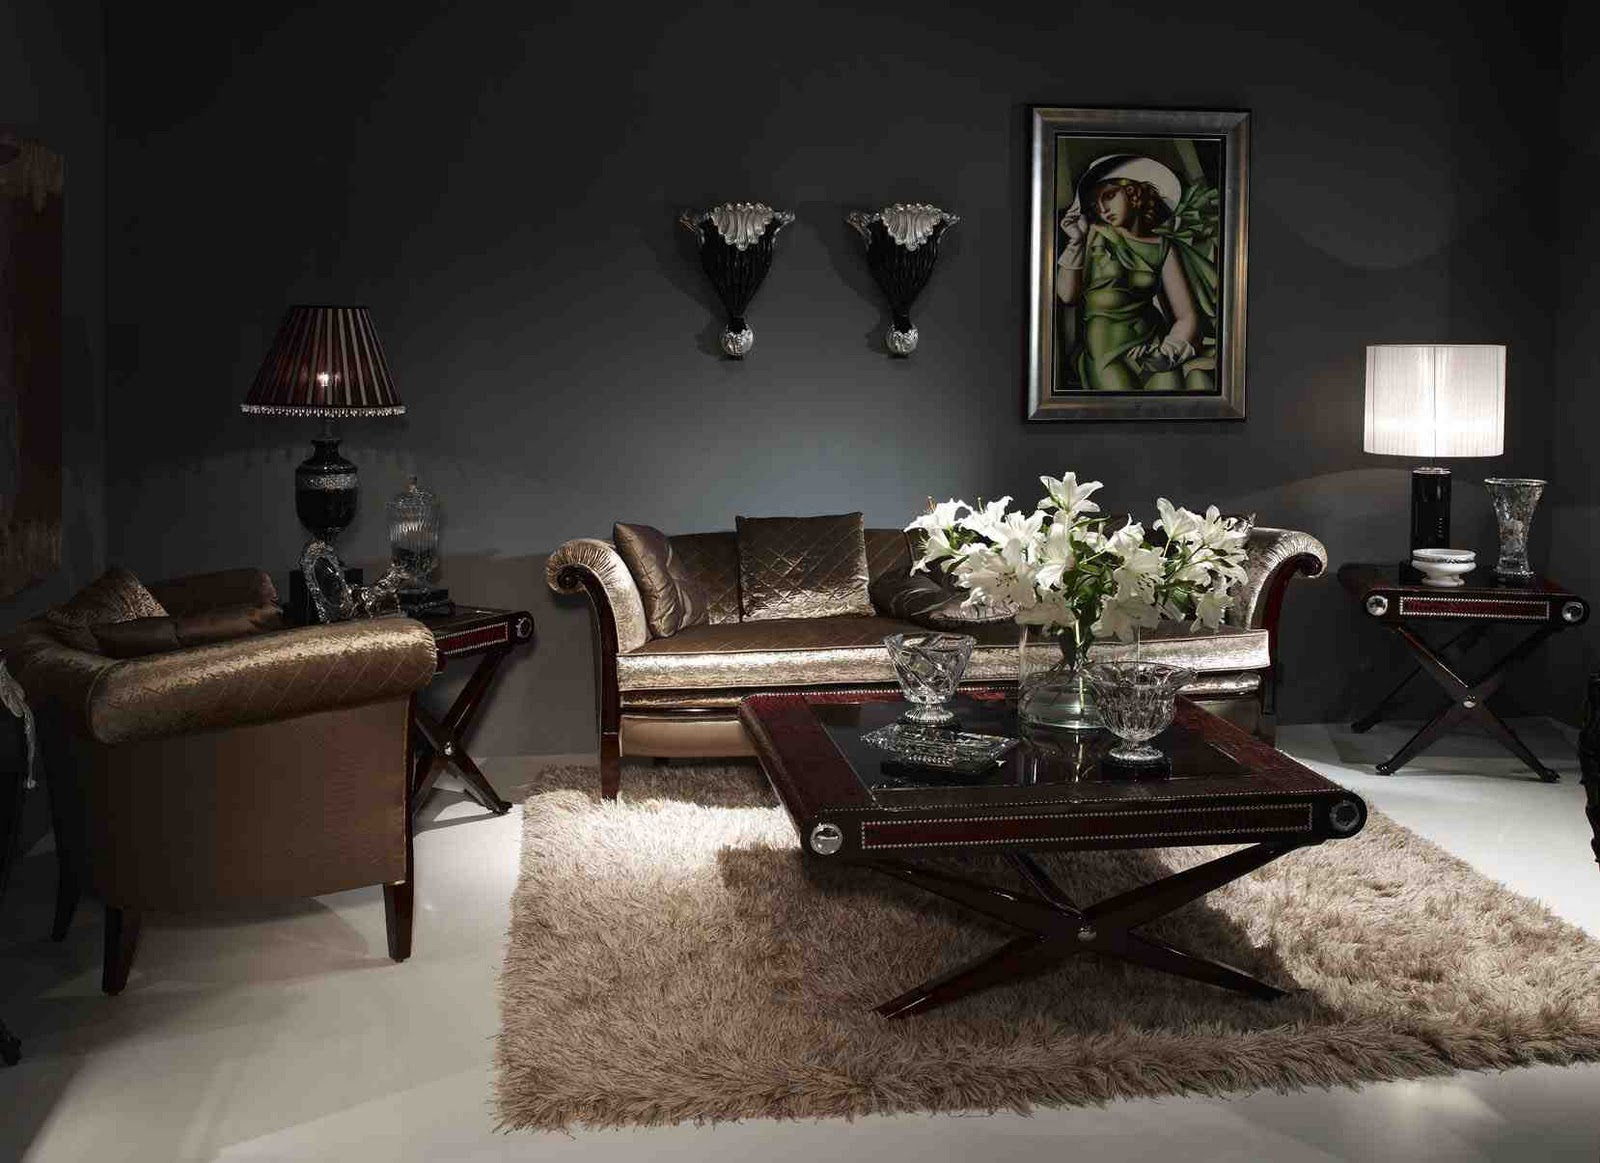 antique italian classic furniture furniture design services for interior design. Black Bedroom Furniture Sets. Home Design Ideas